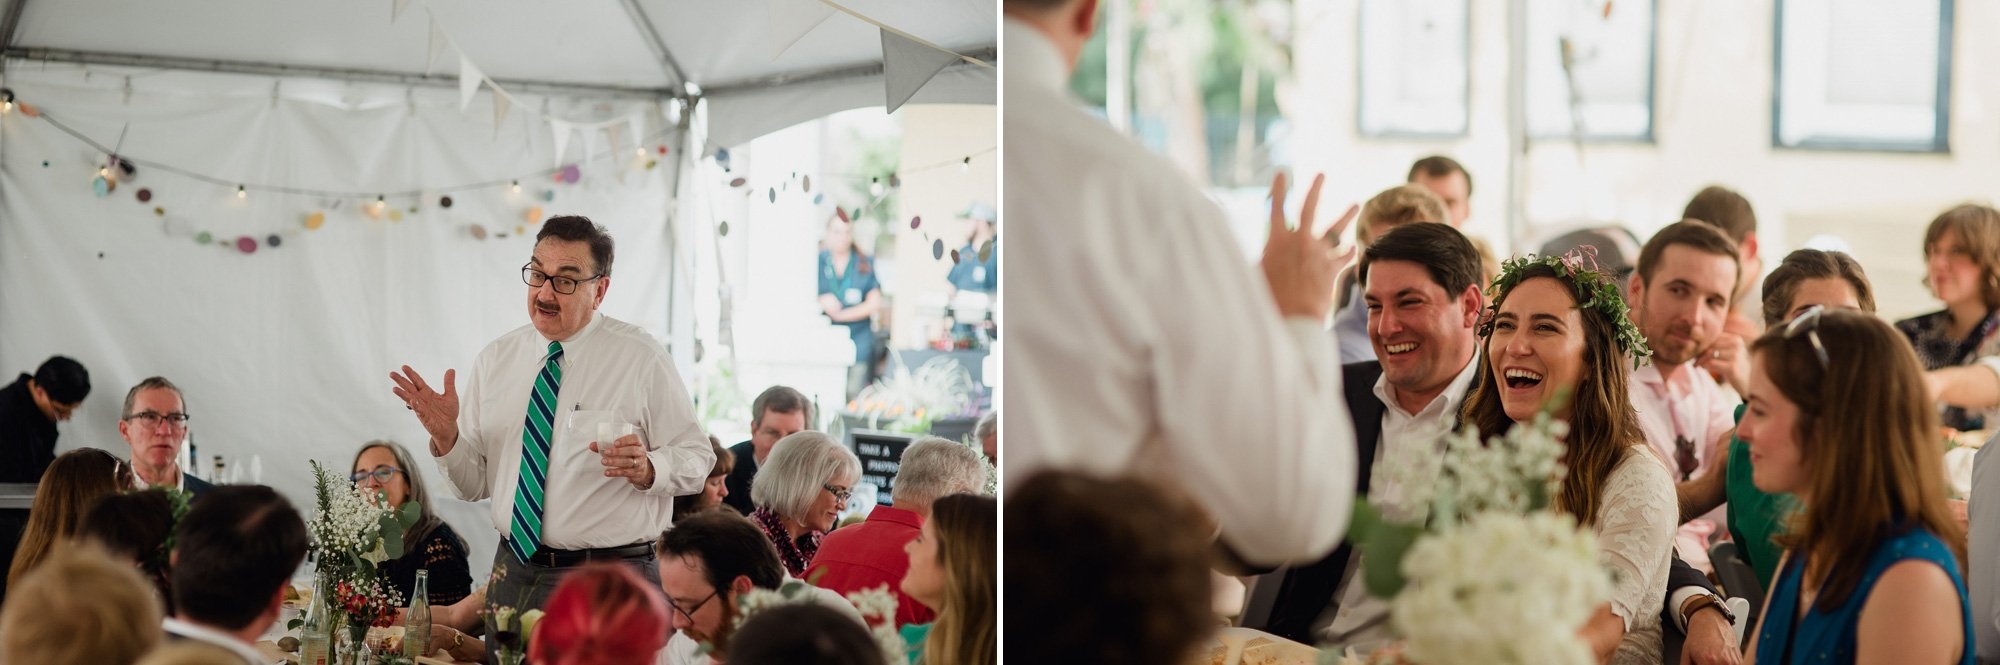 san antonio diy wedding photography, laid-back indie wedding photography in san antonio texas